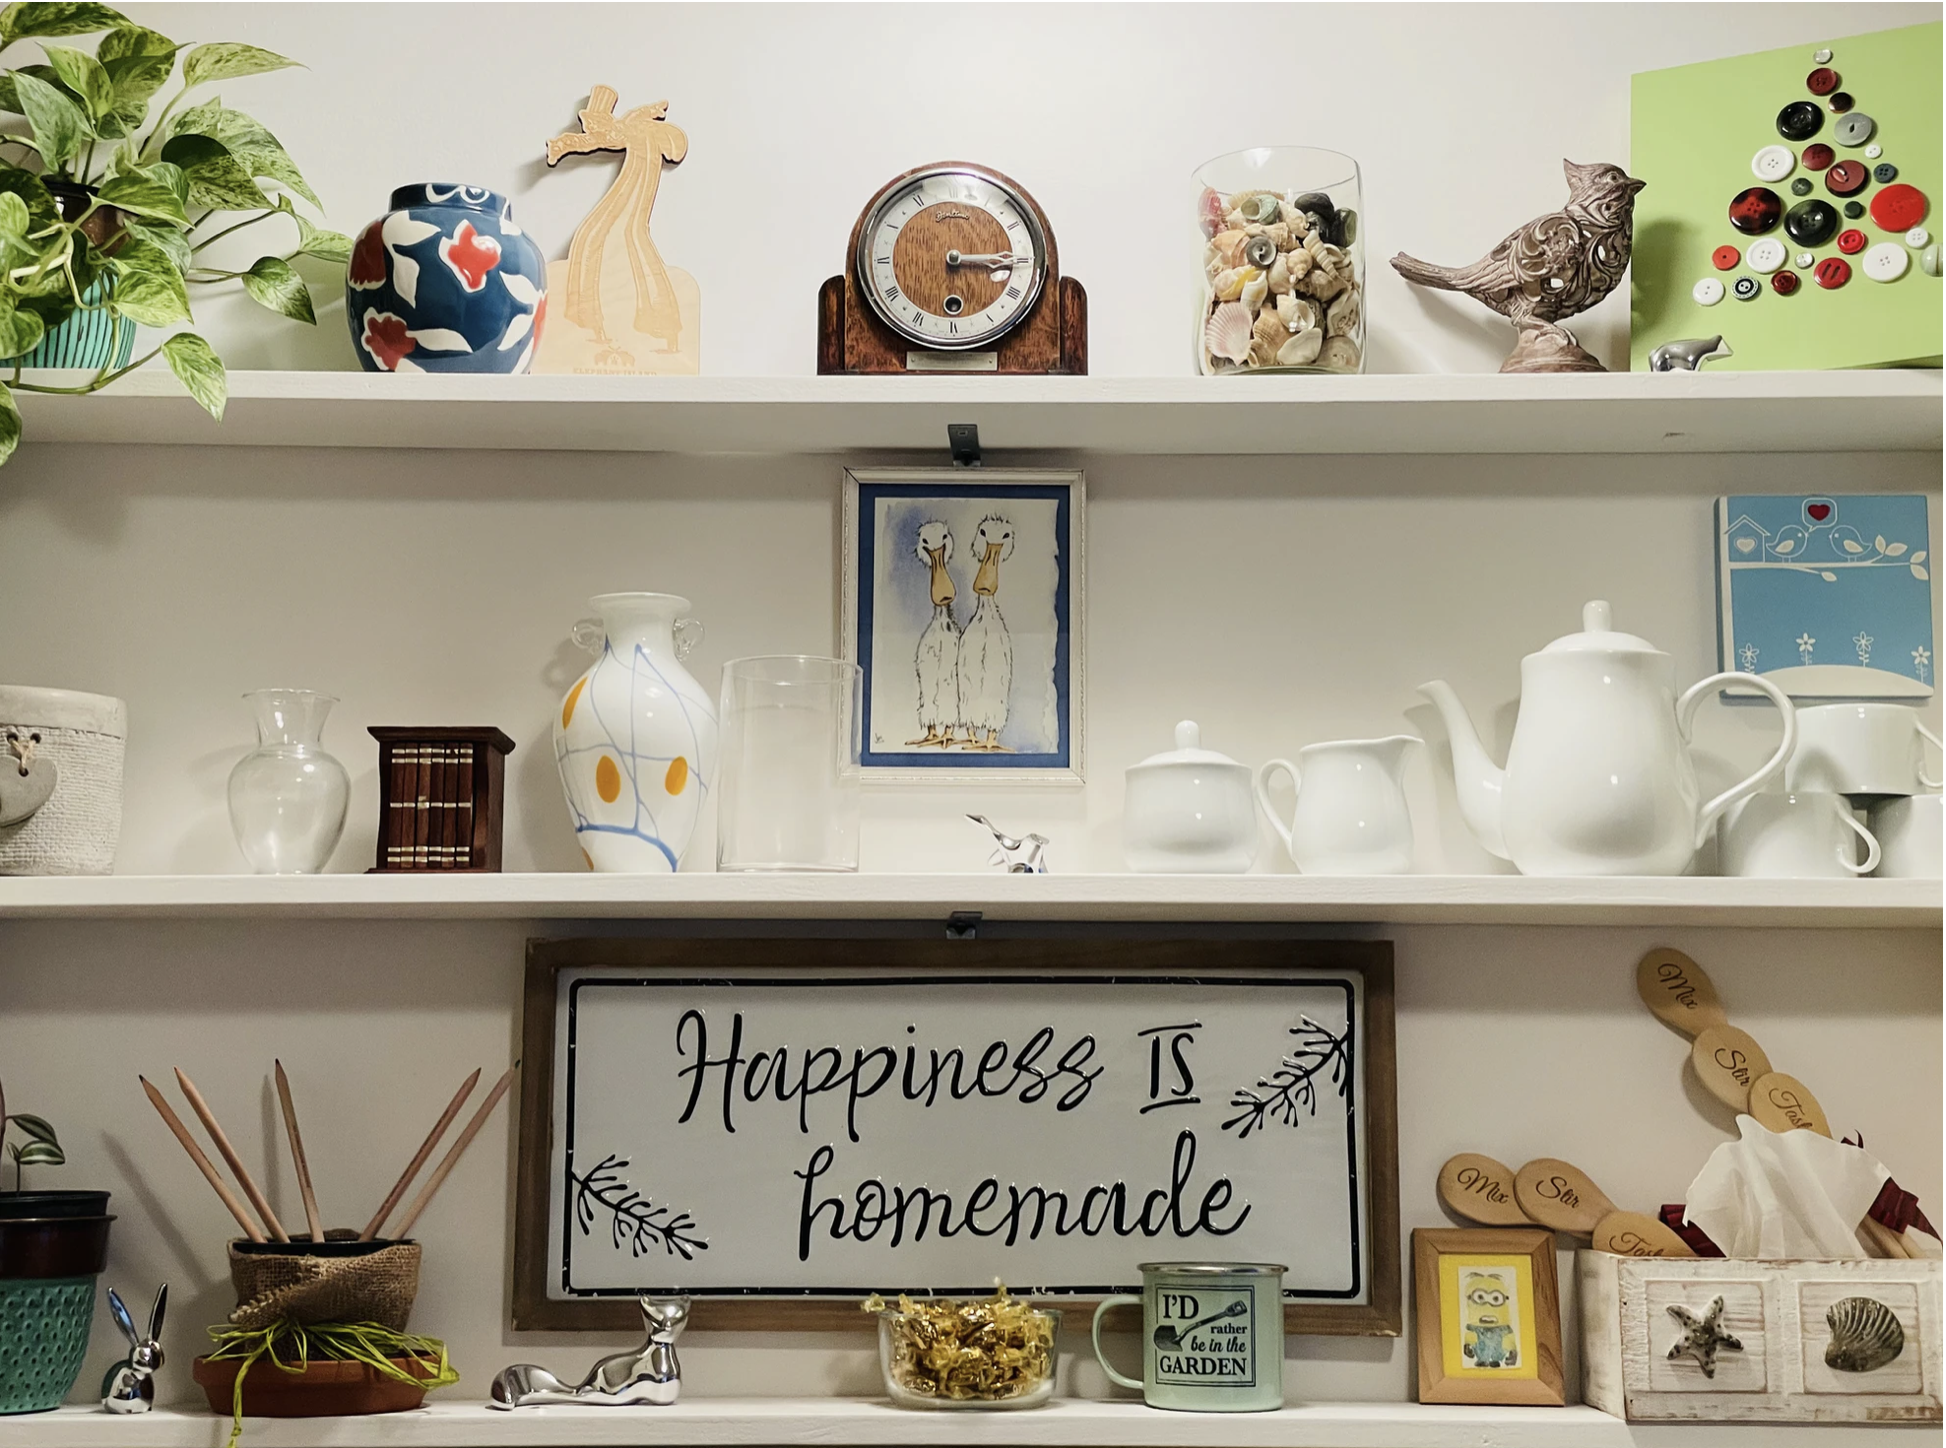 Clutter on kitchen shelves - plants, candies, a clock, and a tea set